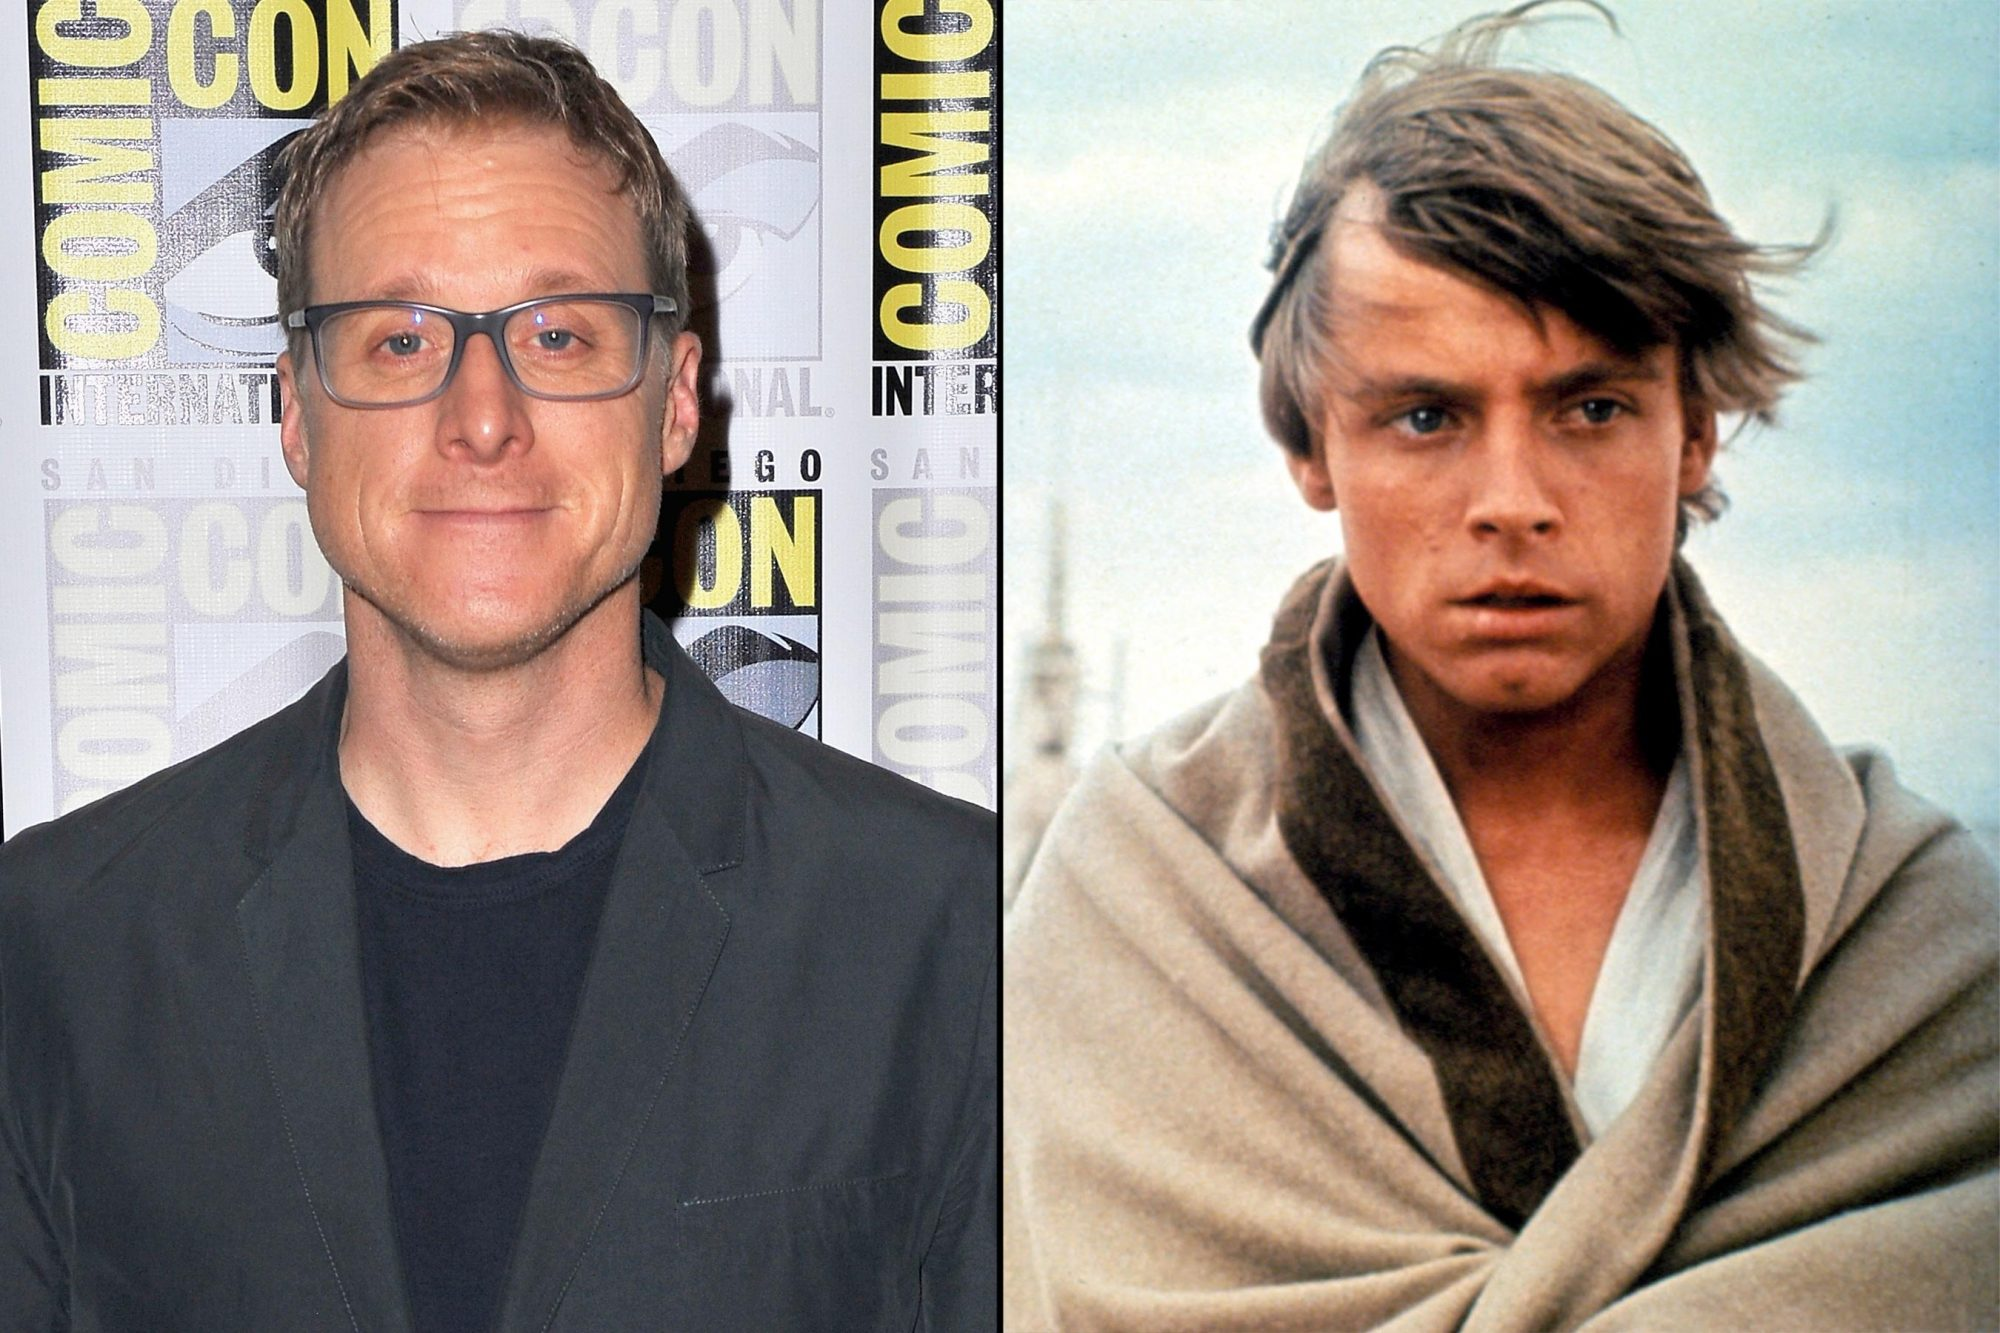 Alan-Tudyk-Star-Wars-A-New-Hope